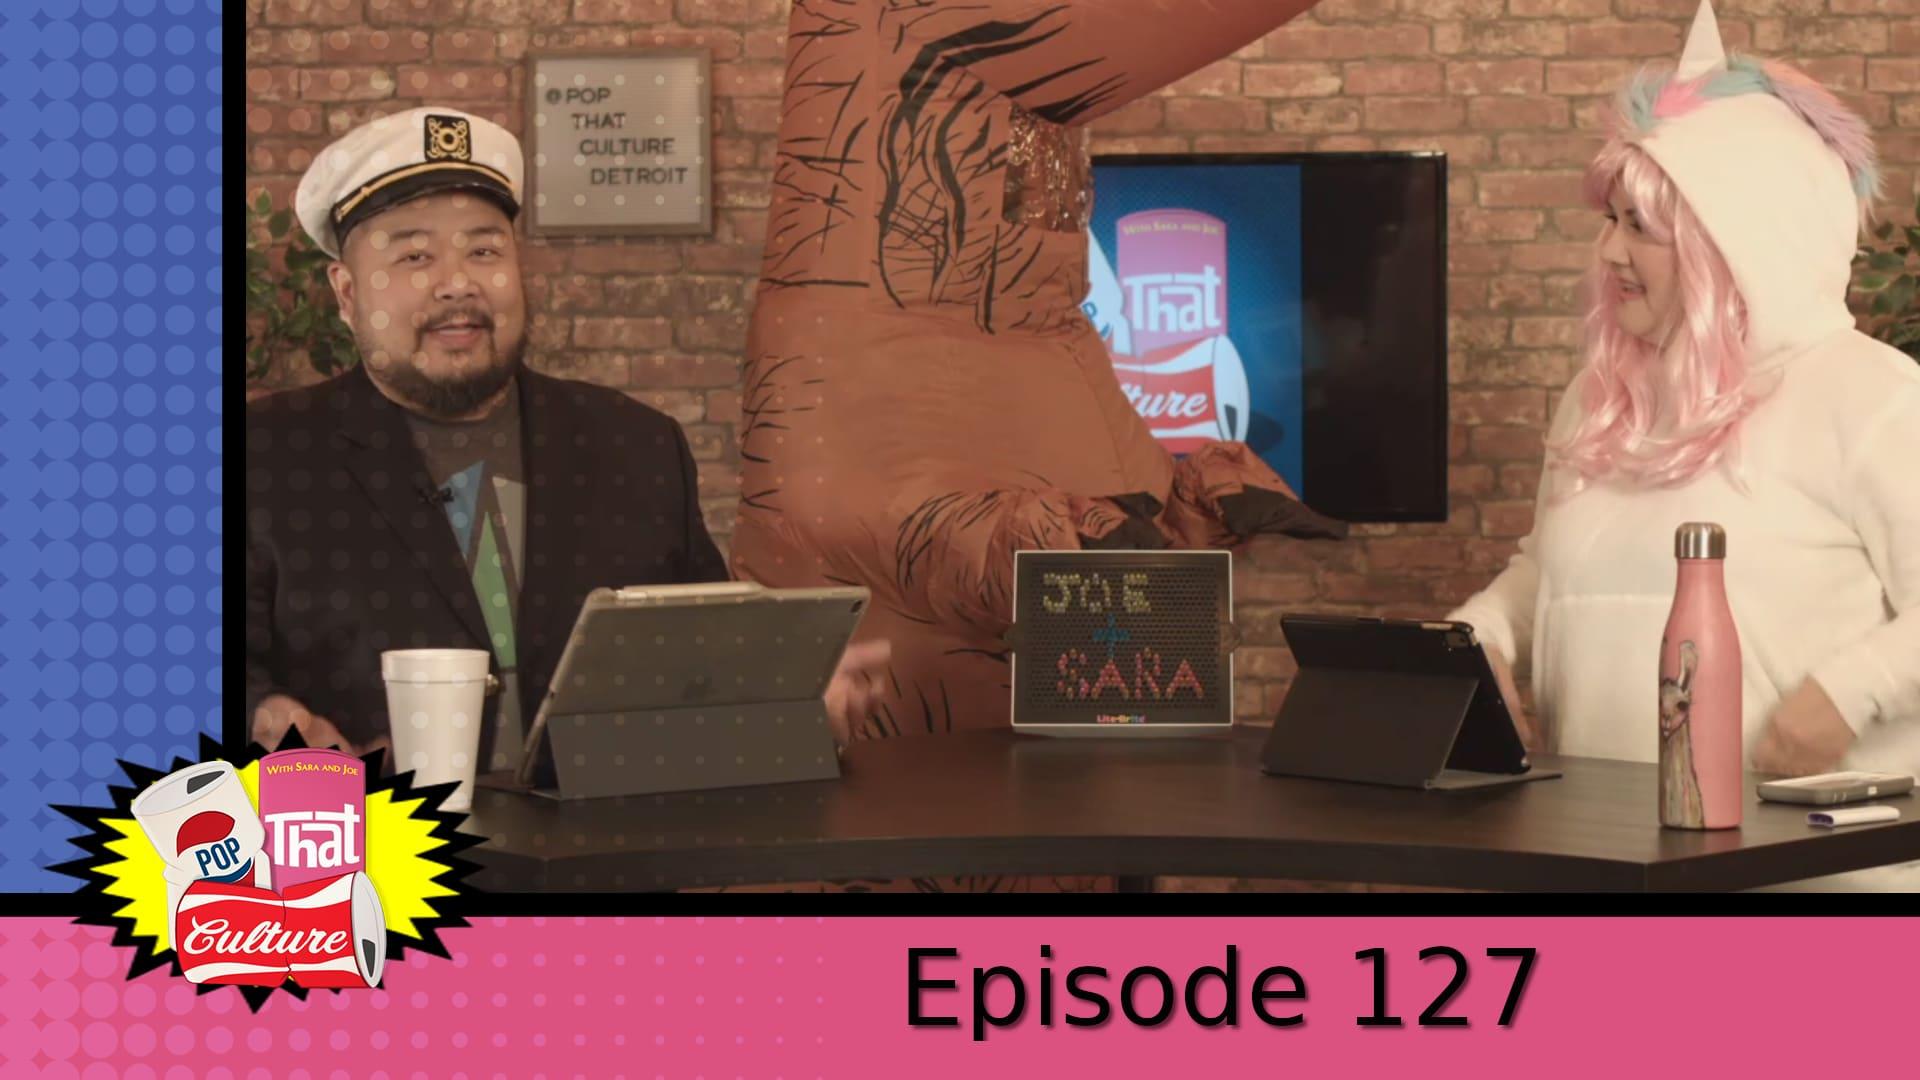 Pop That Culture - Episode 127